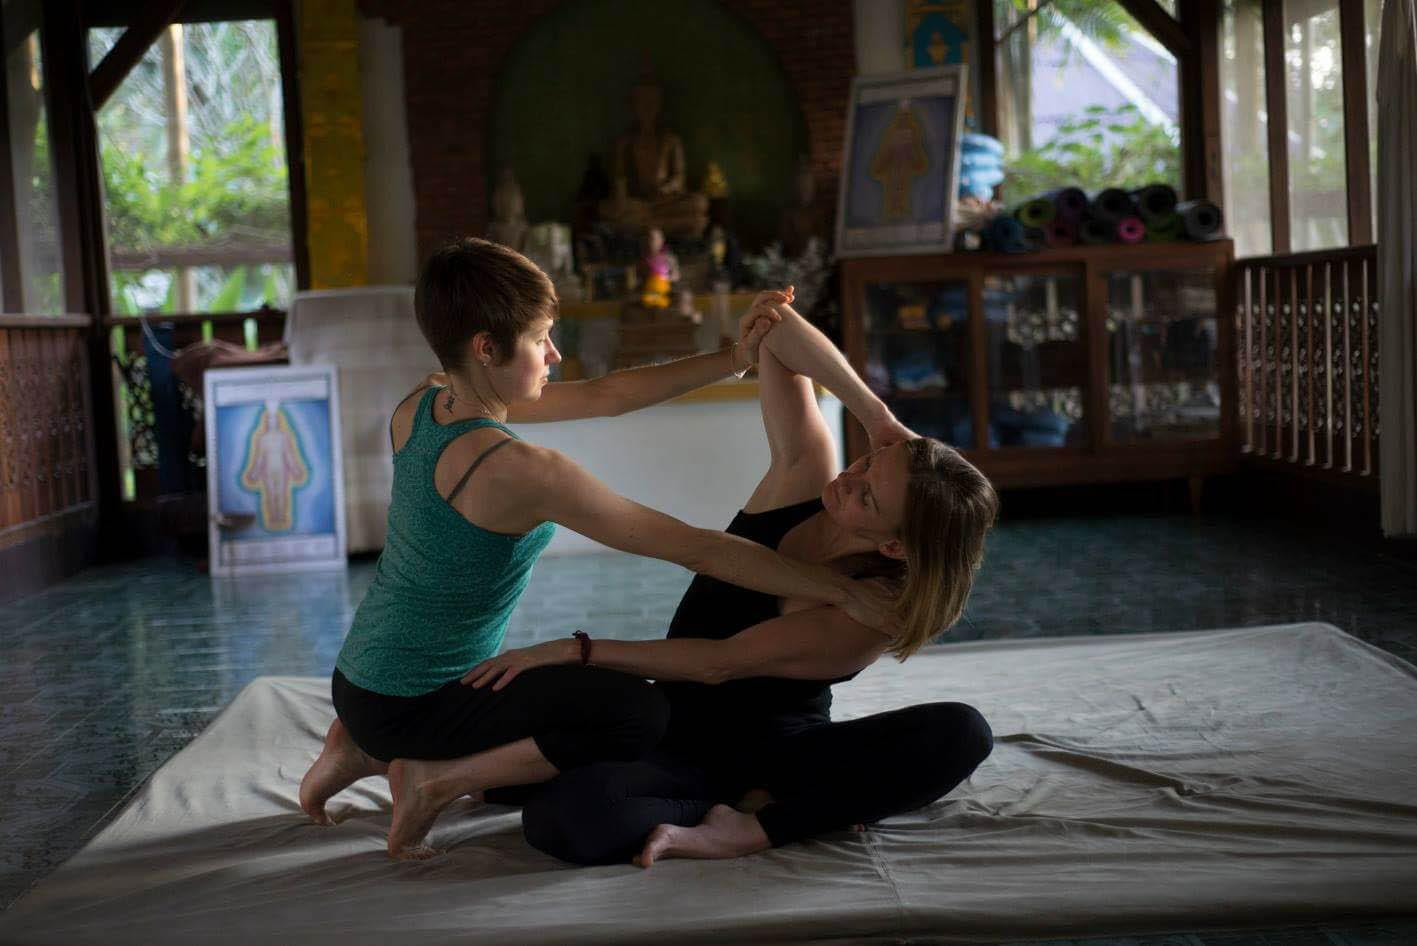 Lothian MassageThai Massage Workshops ~ Lothian Massage